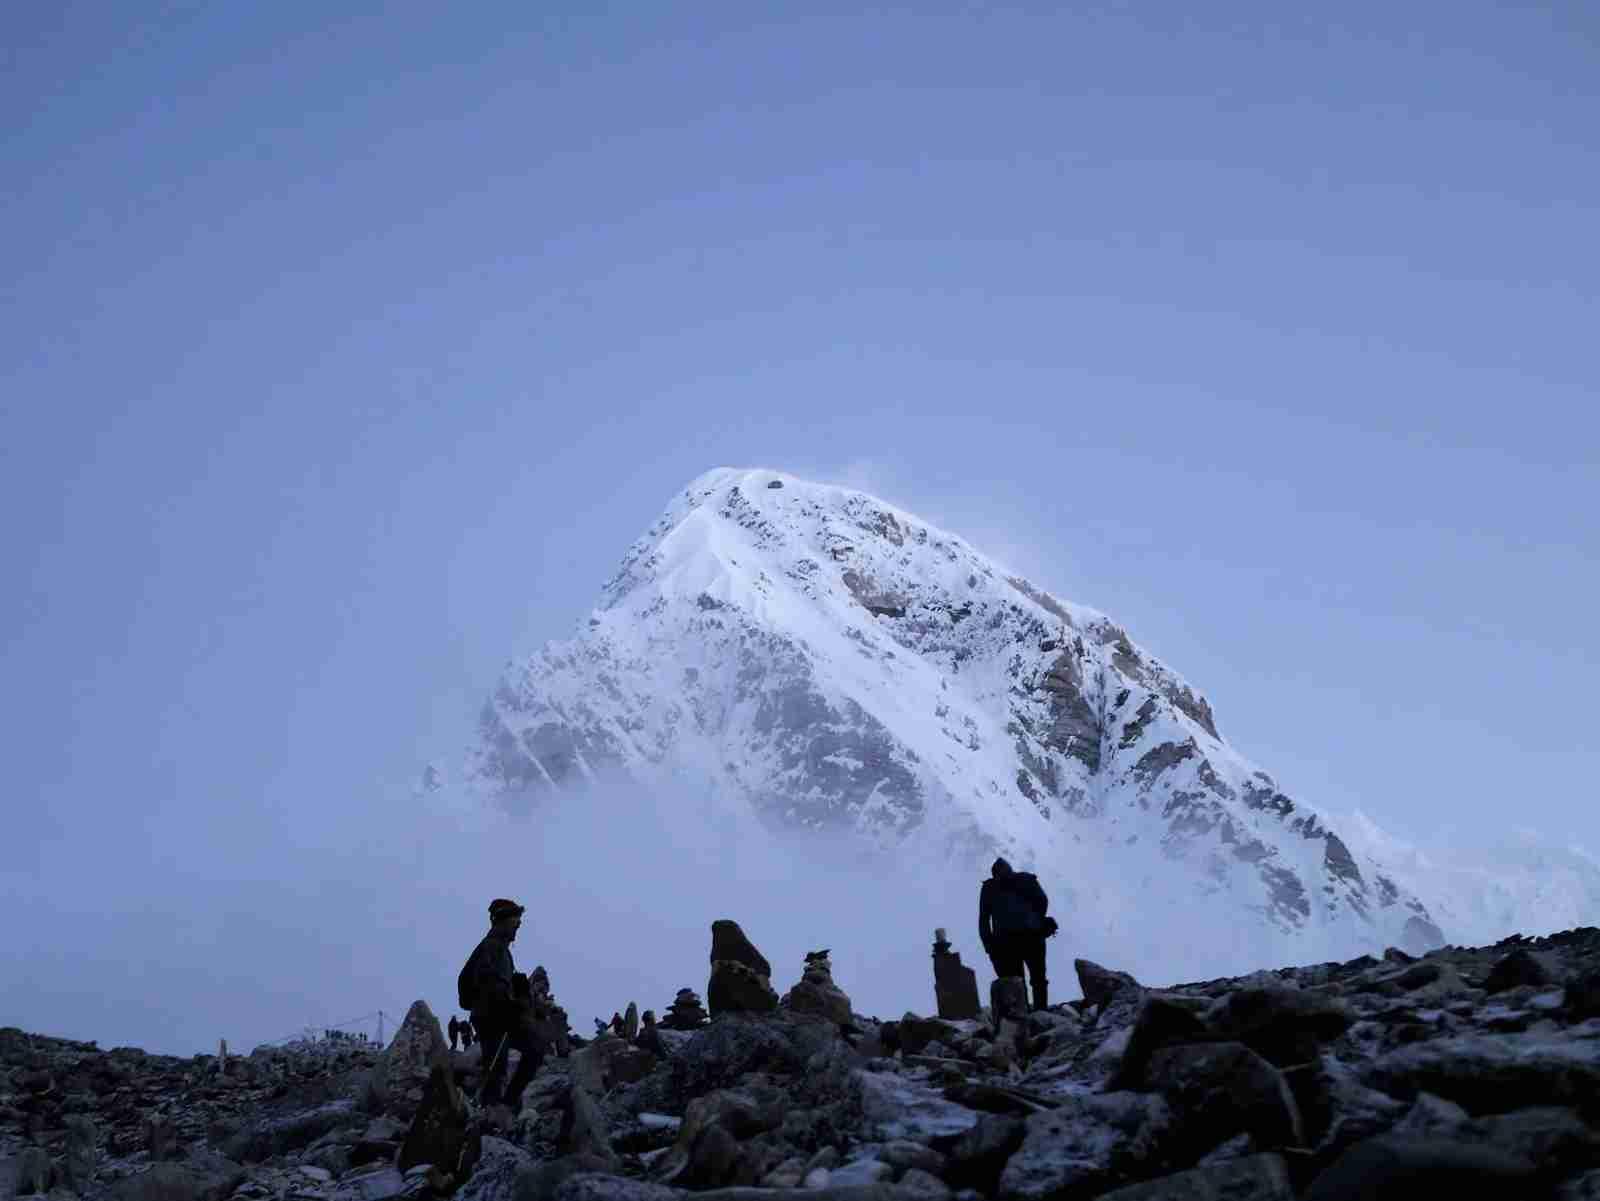 Mount Everest Base Camp in Khumjung, Nepal. (Photo by Michael Clarke / Unsplash)